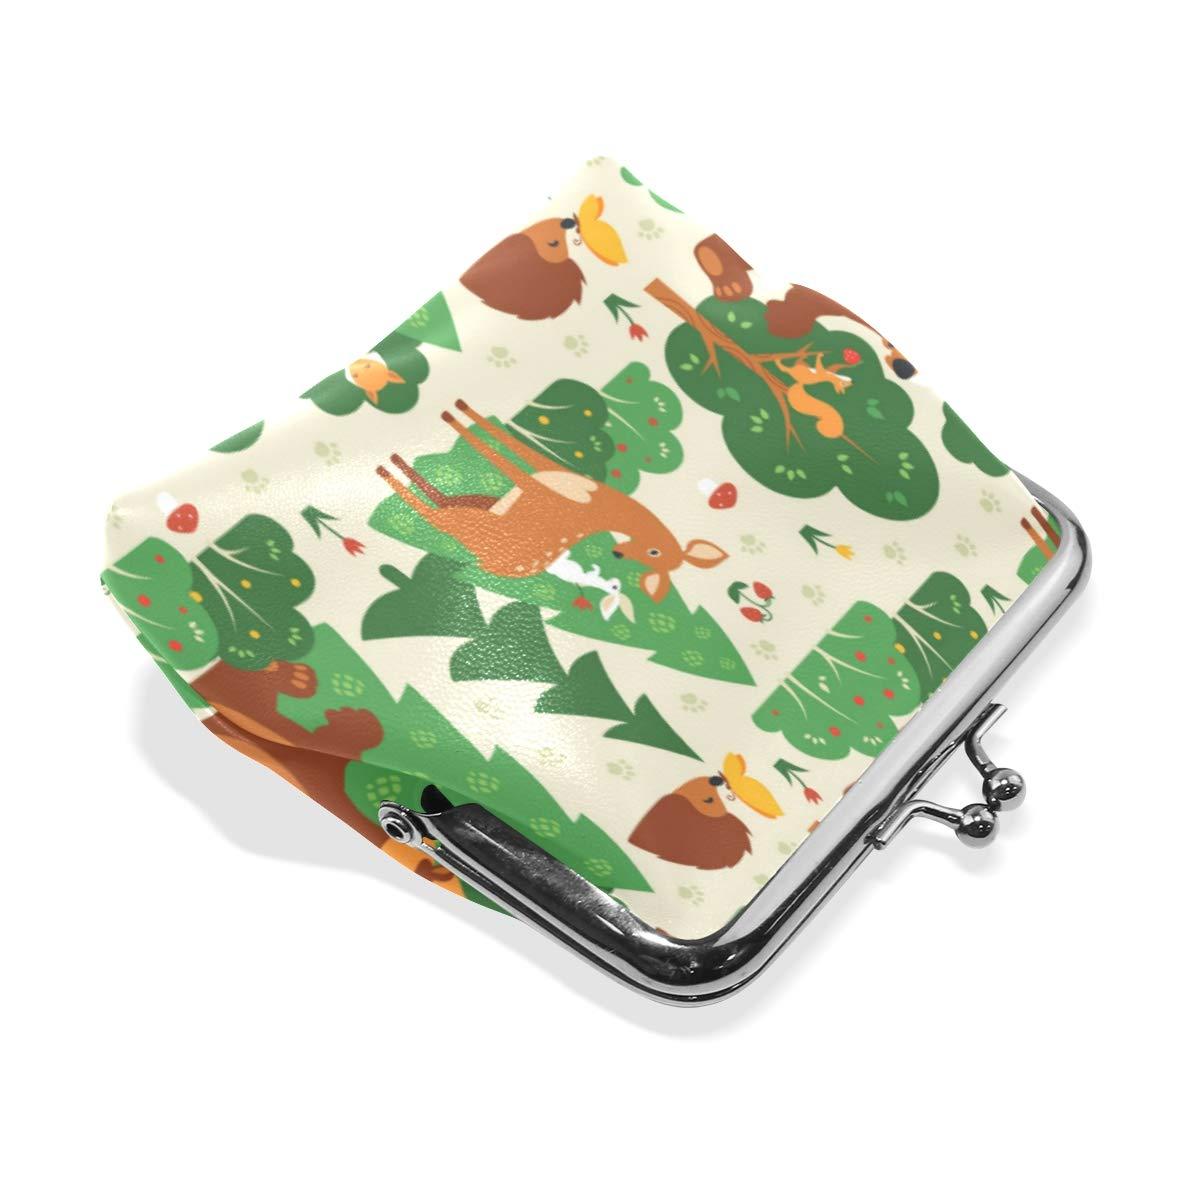 Funny Fox Bear Deer Bunny Hedgehog Coin Purse Buckle Vintage PU Pouch Kiss-lock Wallet for Women Girl